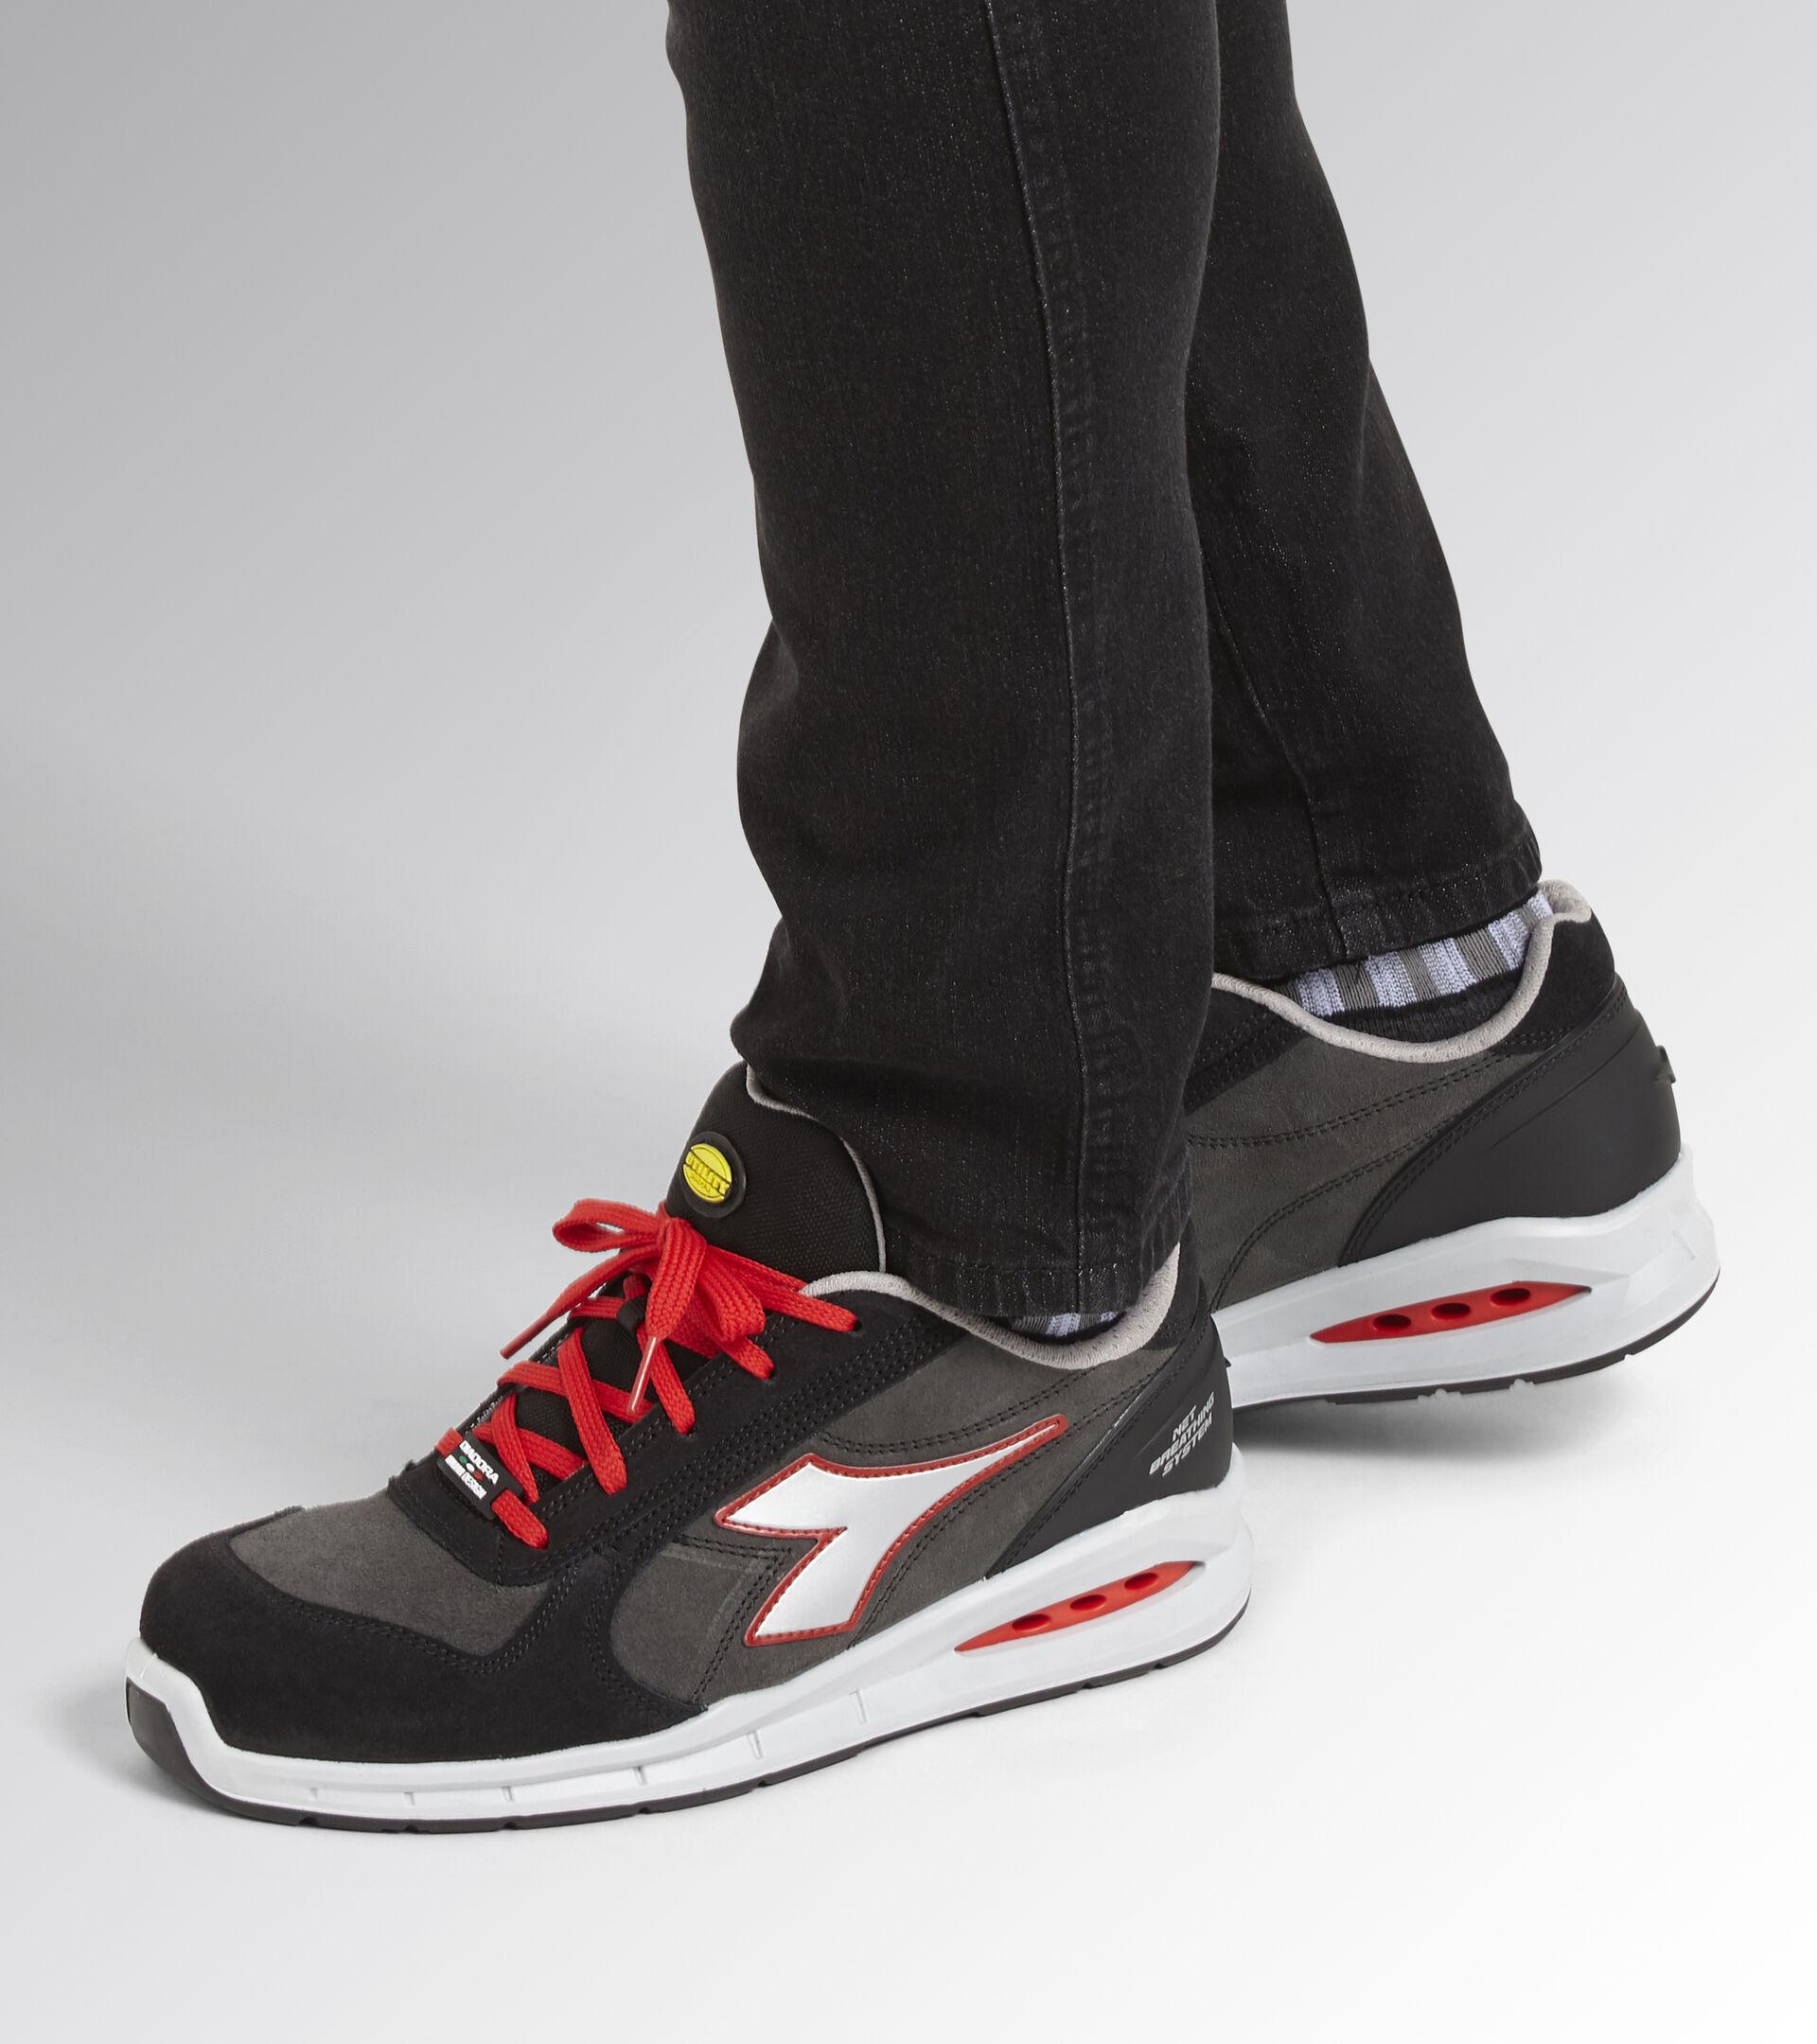 Footwear Utility UNISEX RUN NET AIRBOX LOW S3 SRC ASPHALT/SILVER/RED Utility